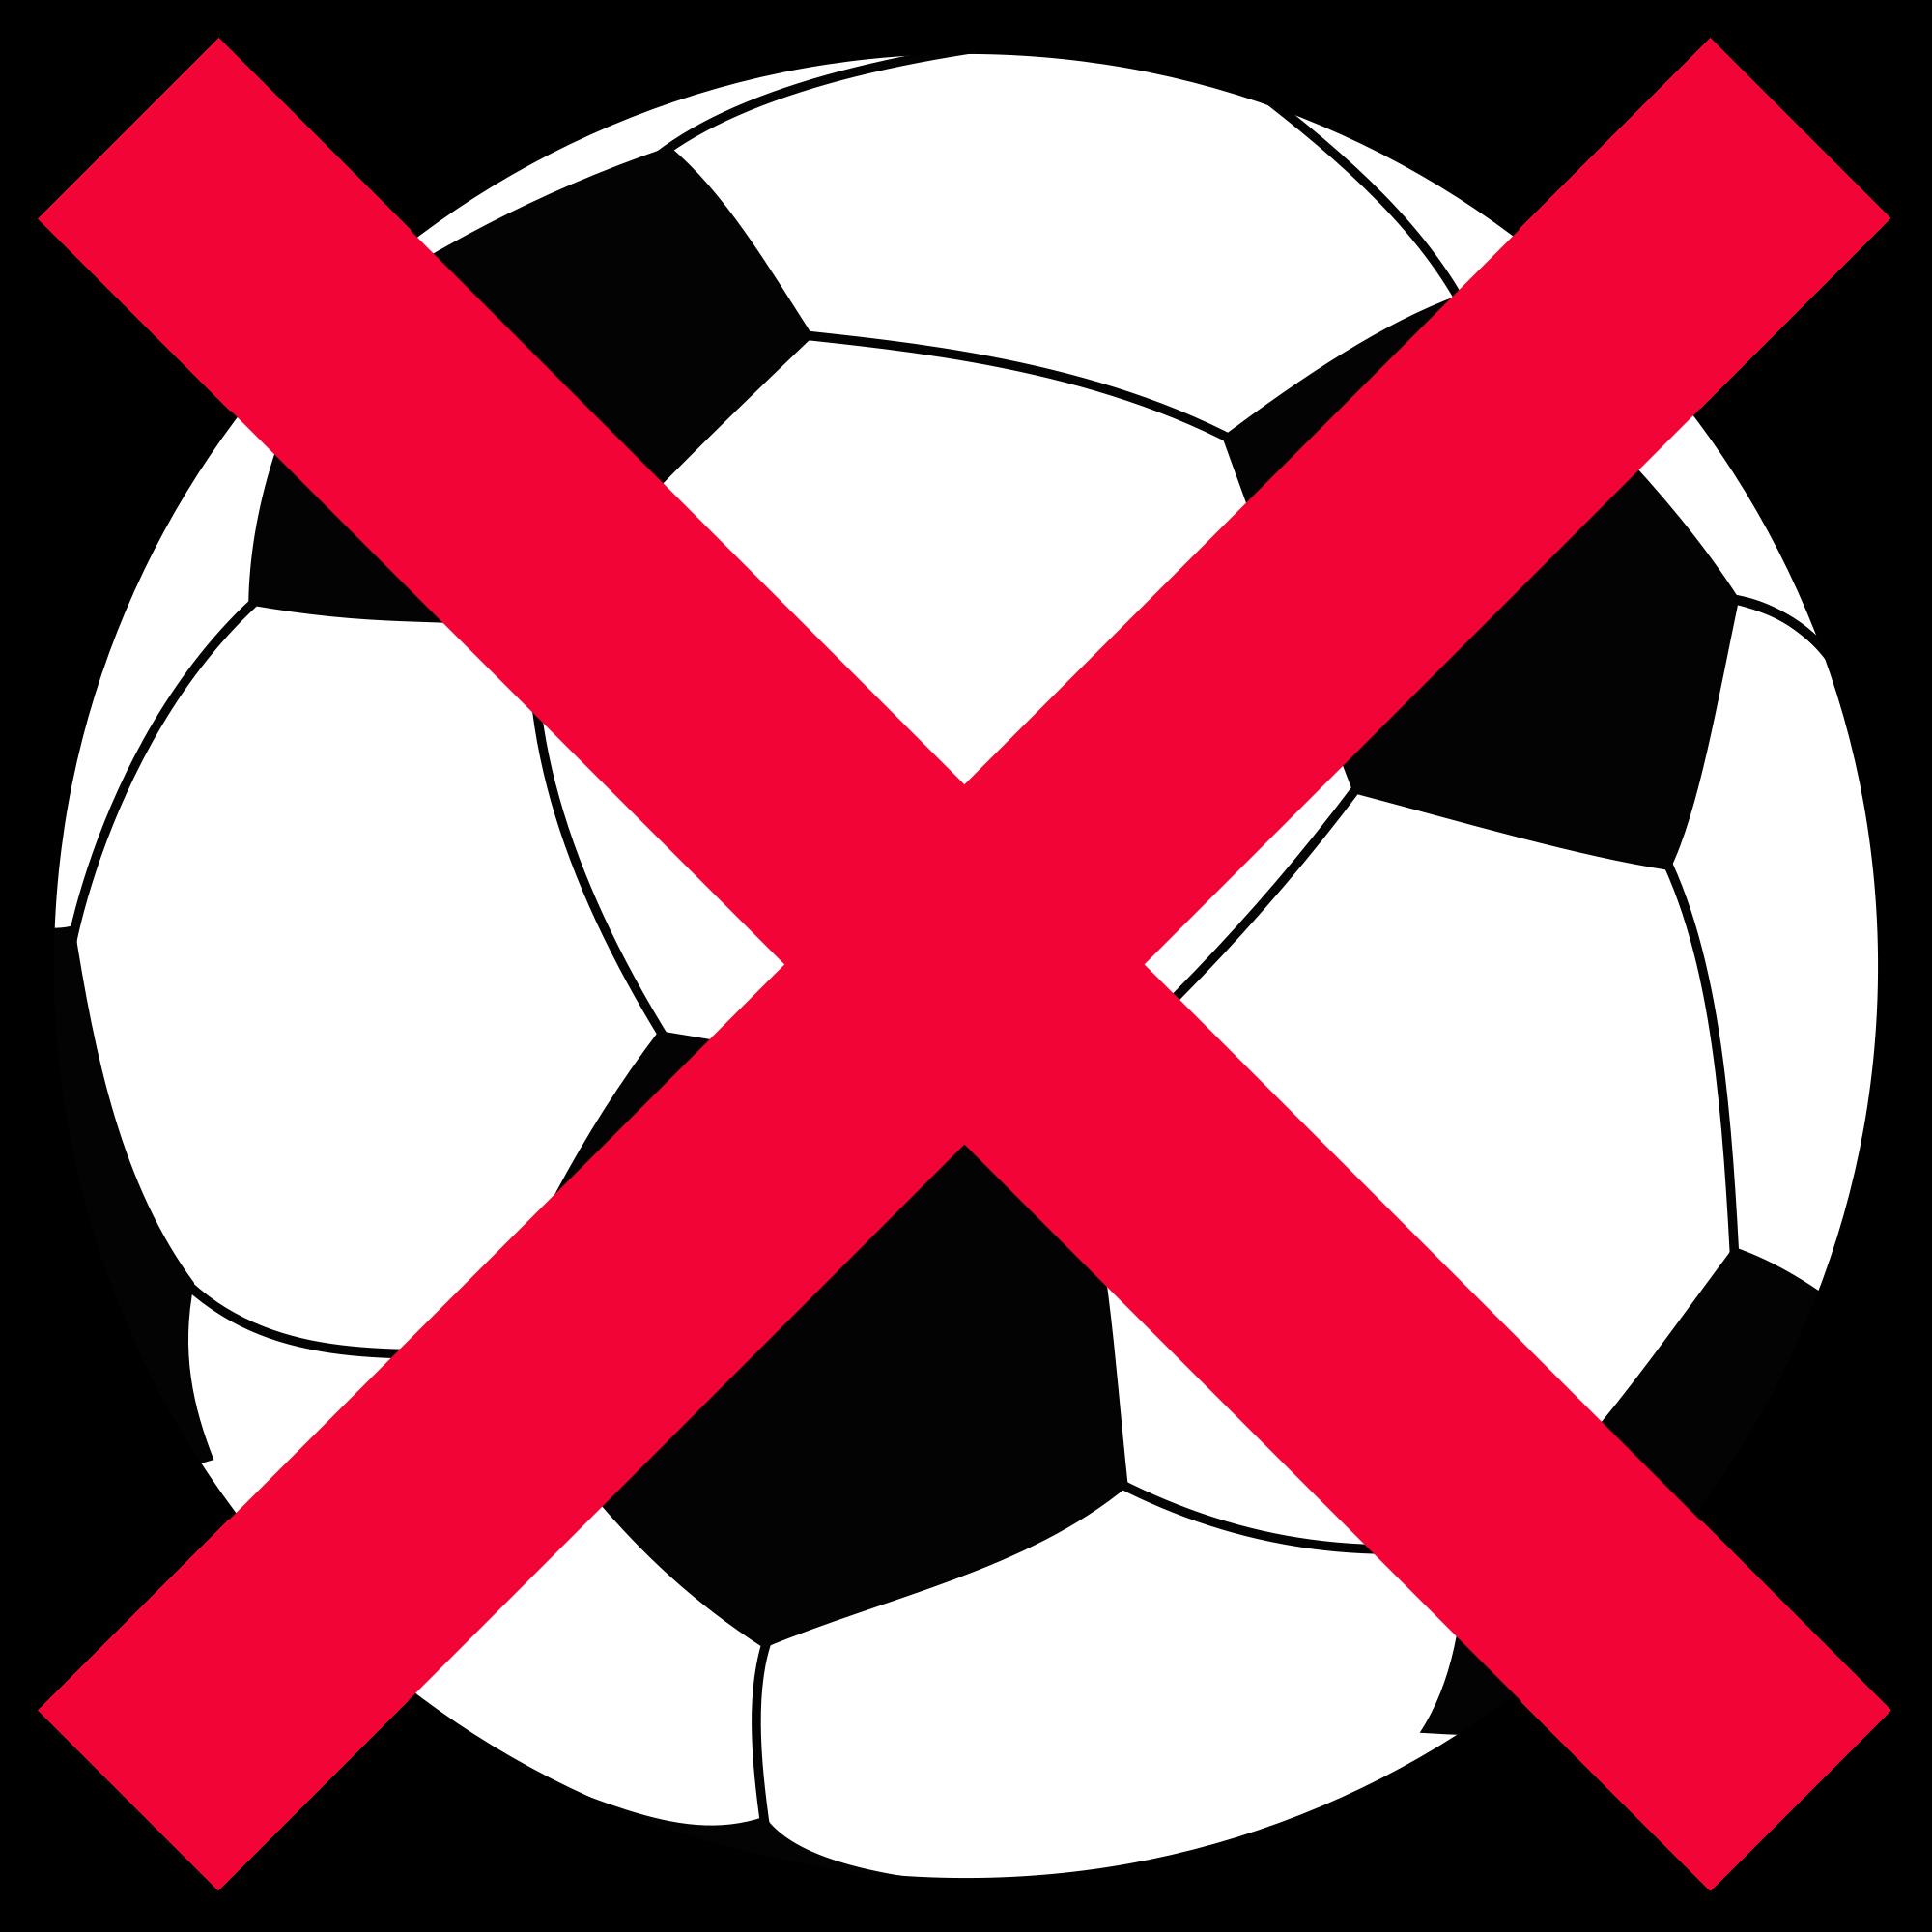 No football clipart clip free stock File:Football-NO.svg - Wikimedia Commons clip free stock